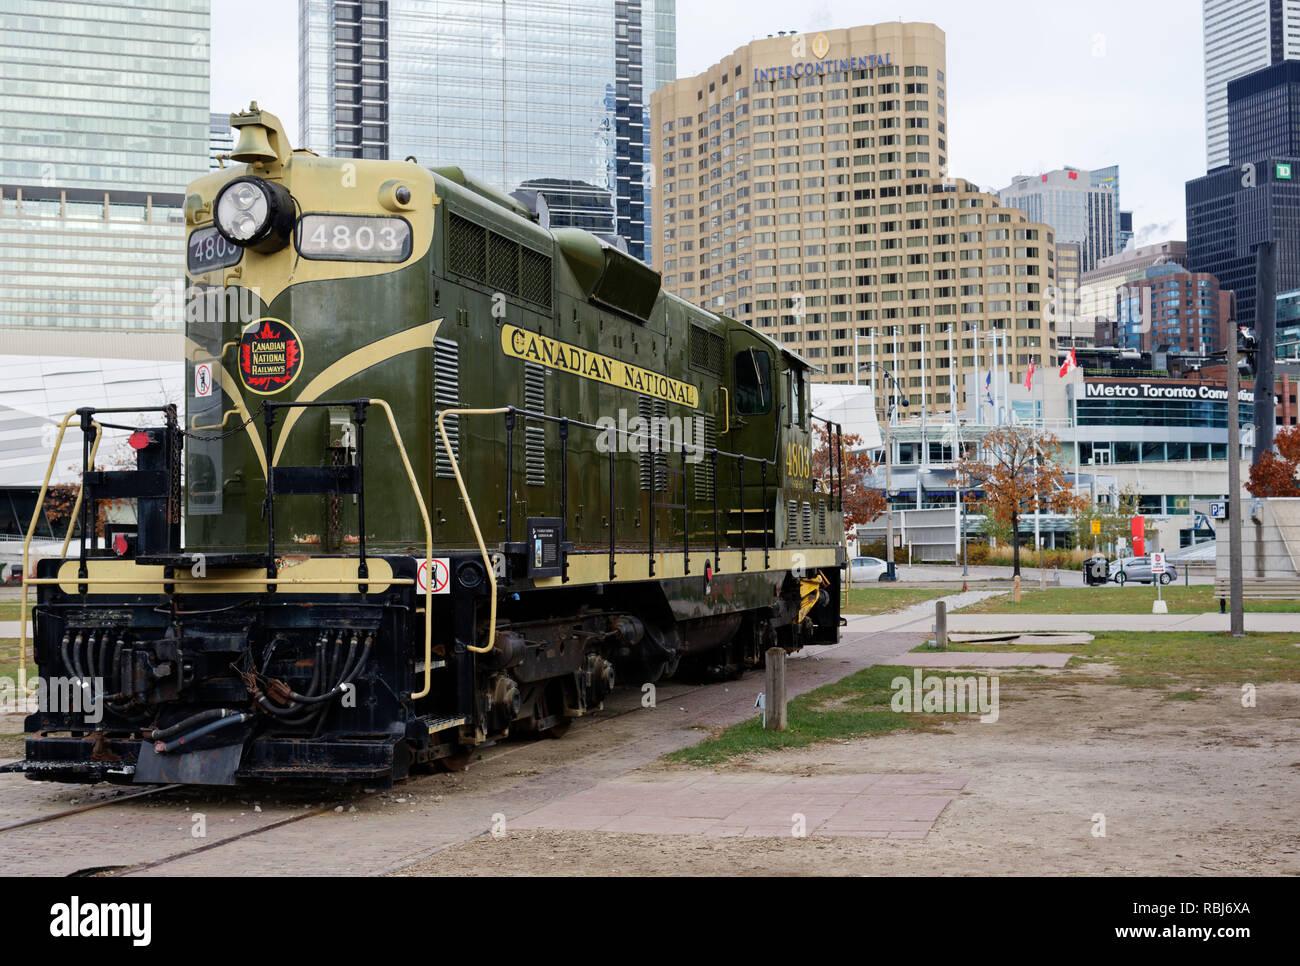 Canadian National GP7 High-Nose Locomotive at Toronto Railway Museum, number 4203 - Stock Image